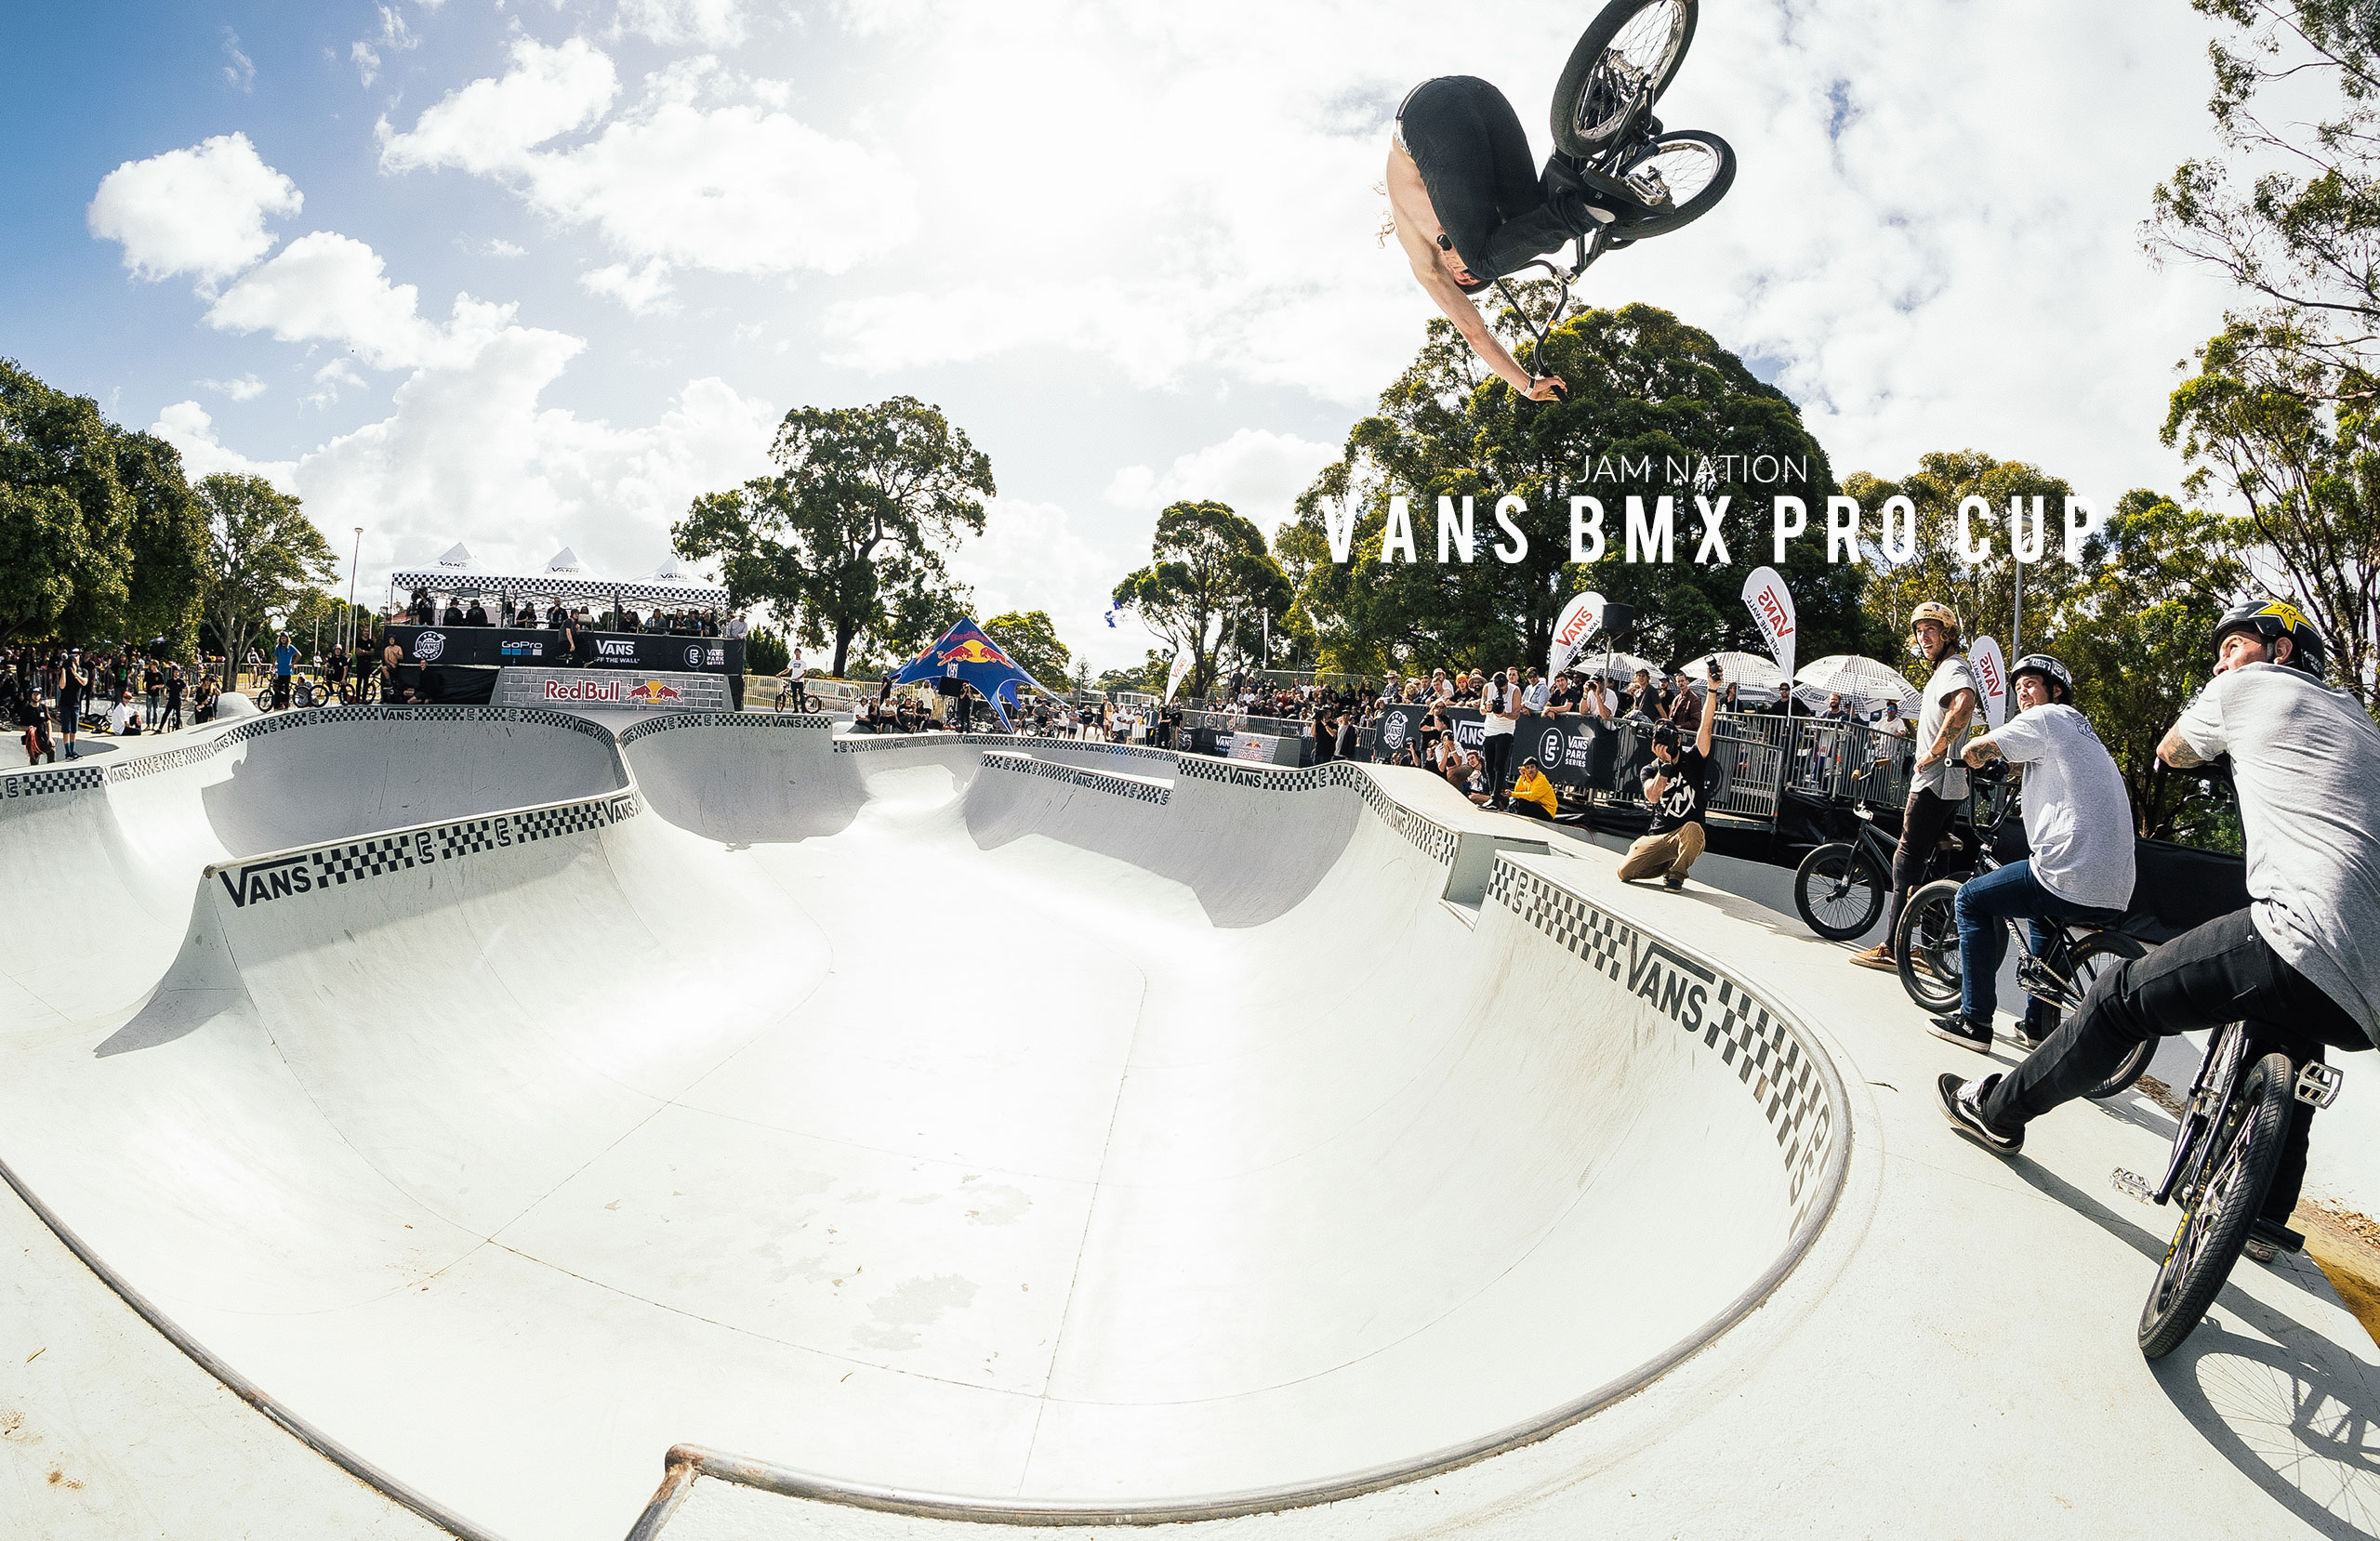 Vans BMX Pro Cup – Gallery #2